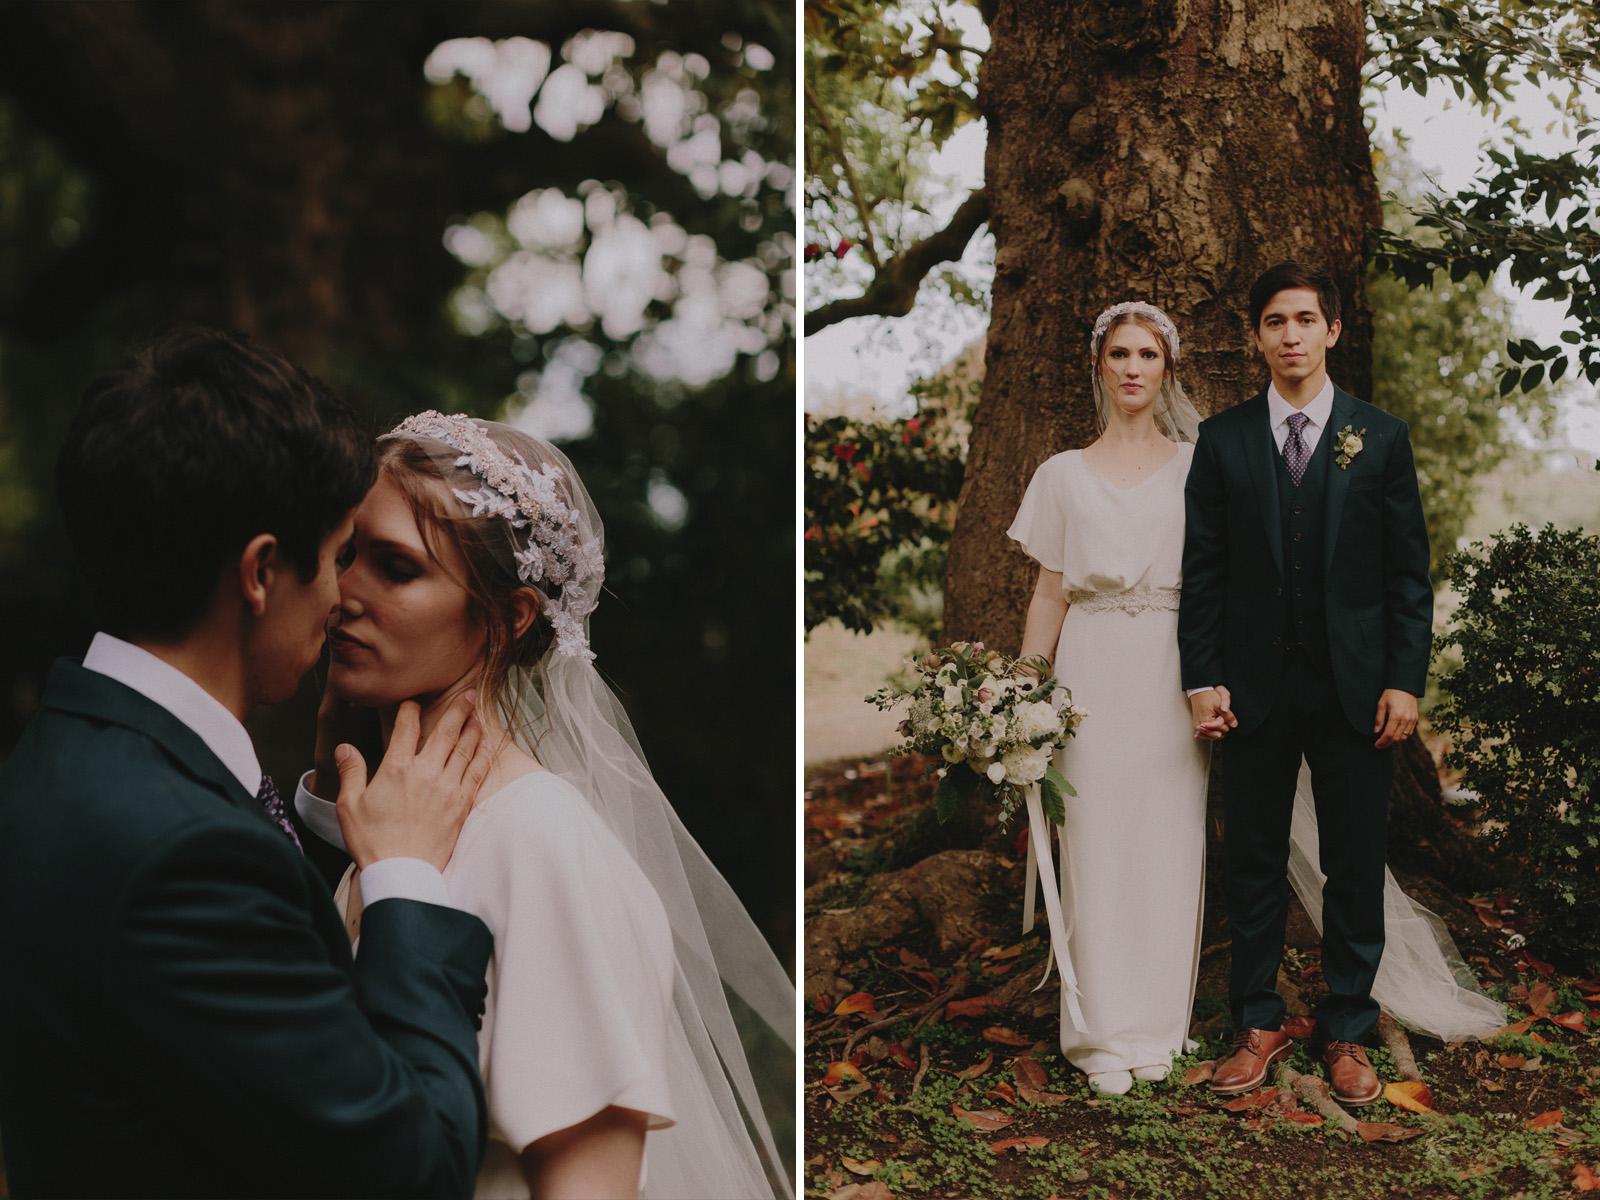 trish-lee-blouson-wedding-dress-3.jpg